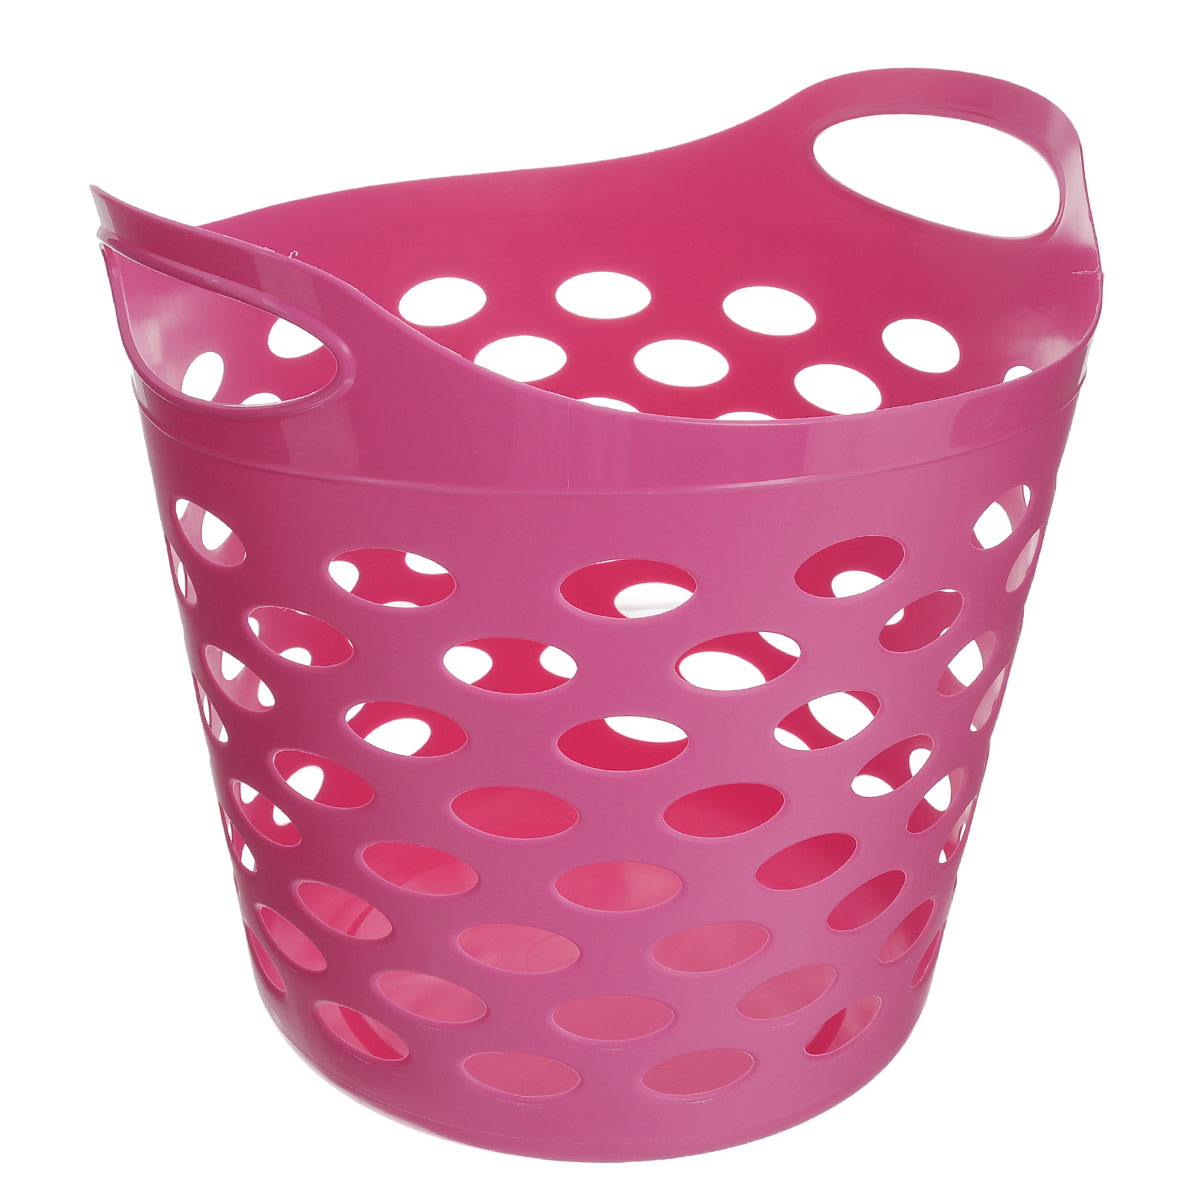 Корзина универсальная Gensini, цвет: розовый, 32 л корзины сотовые 120х450х450 белая